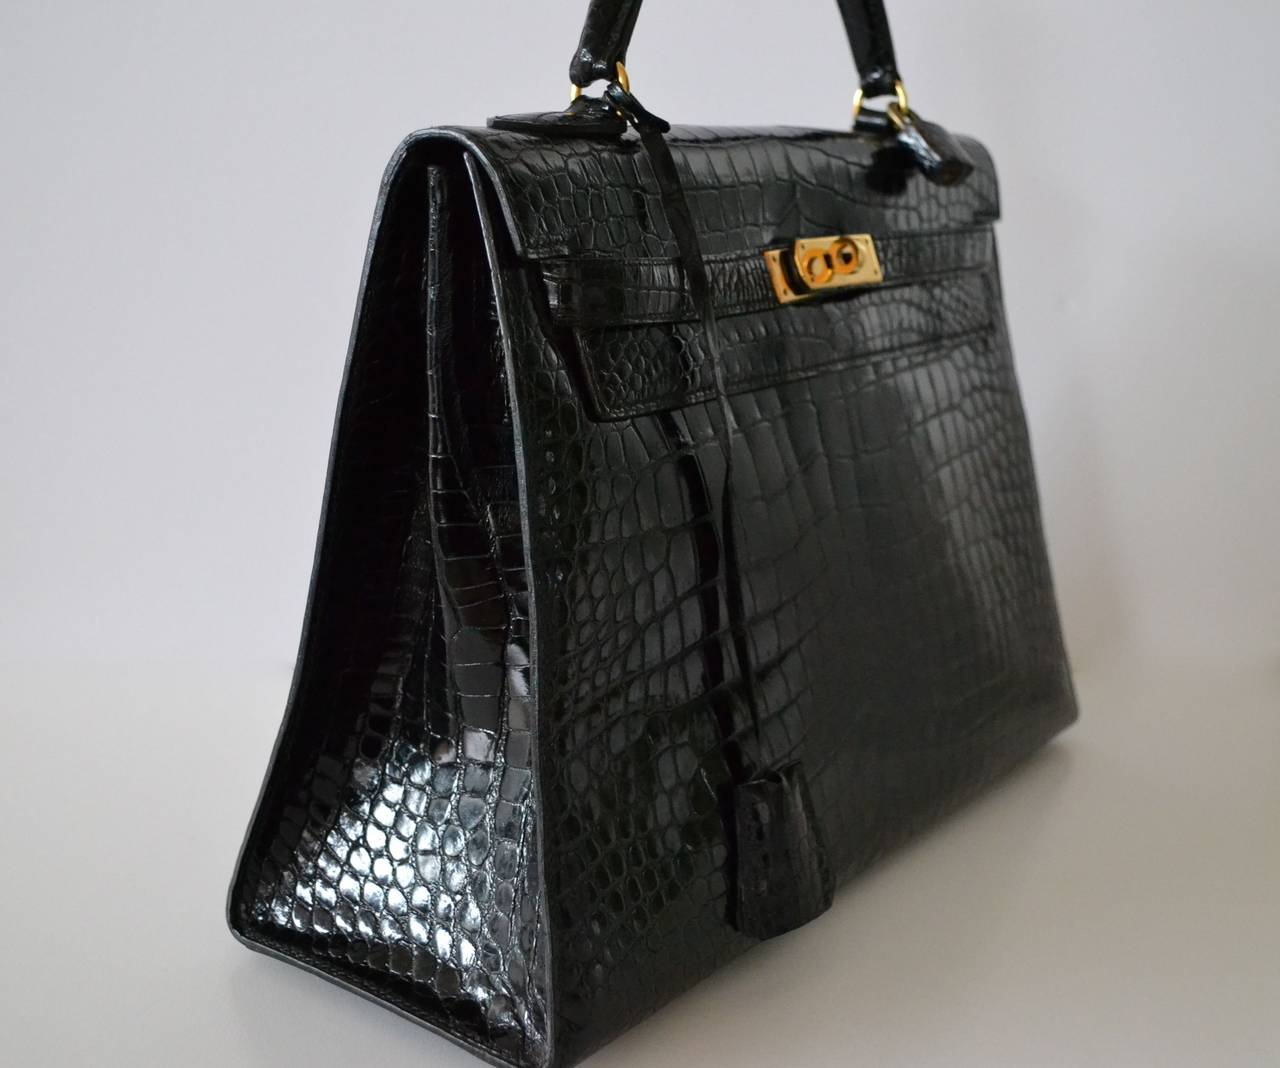 birkin handbag price - Hermes Kelly 32 Black crocodile Porosus at 1stdibs